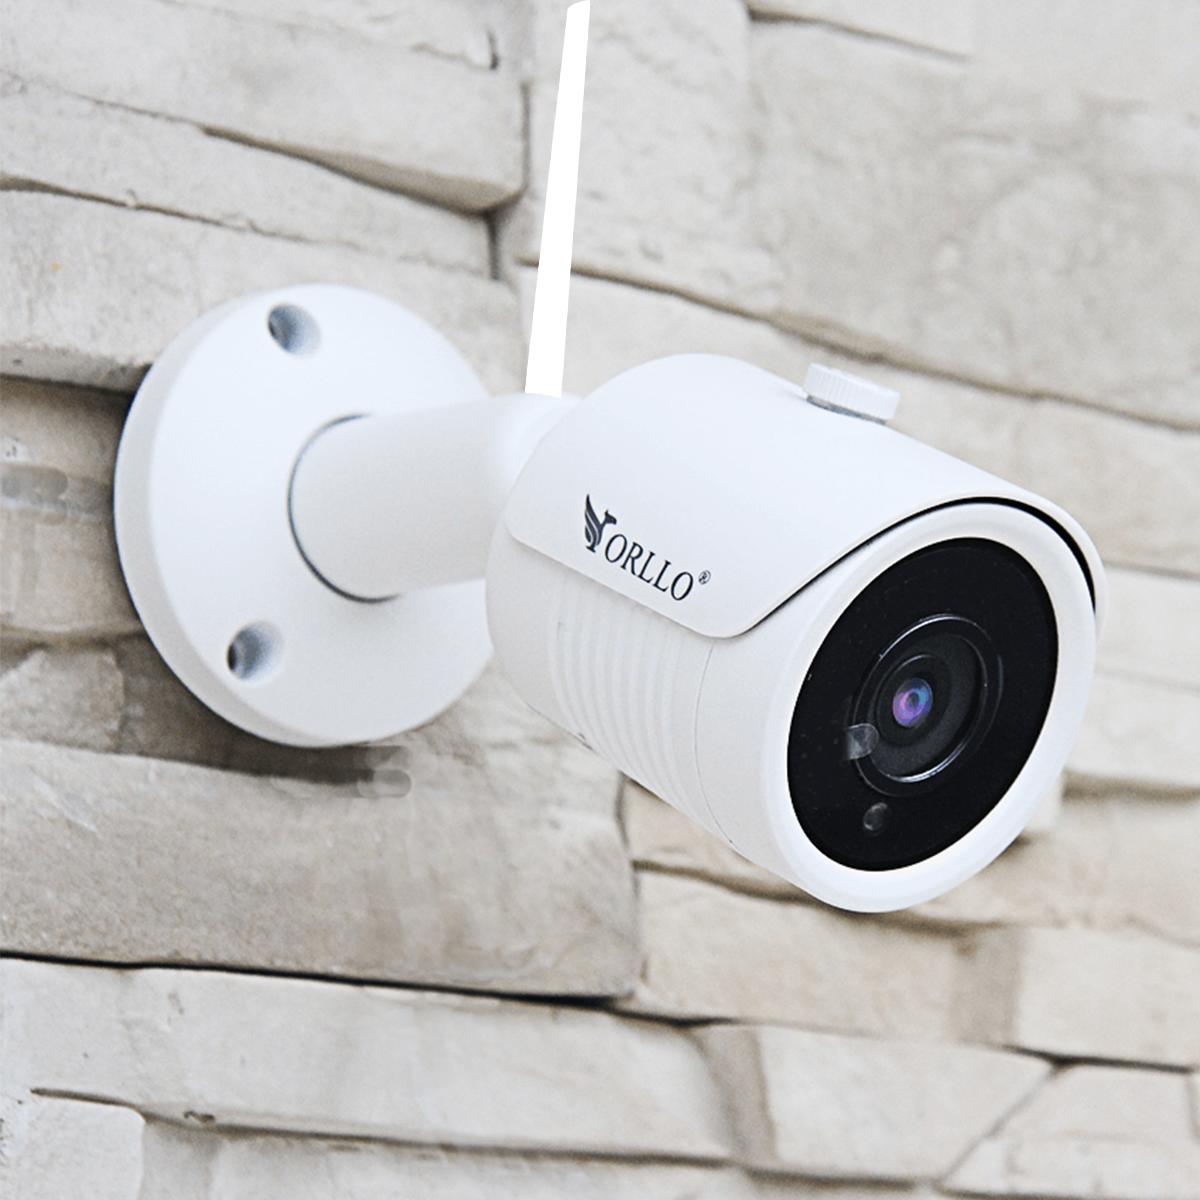 kamery monitoring magazynu orllo.pl